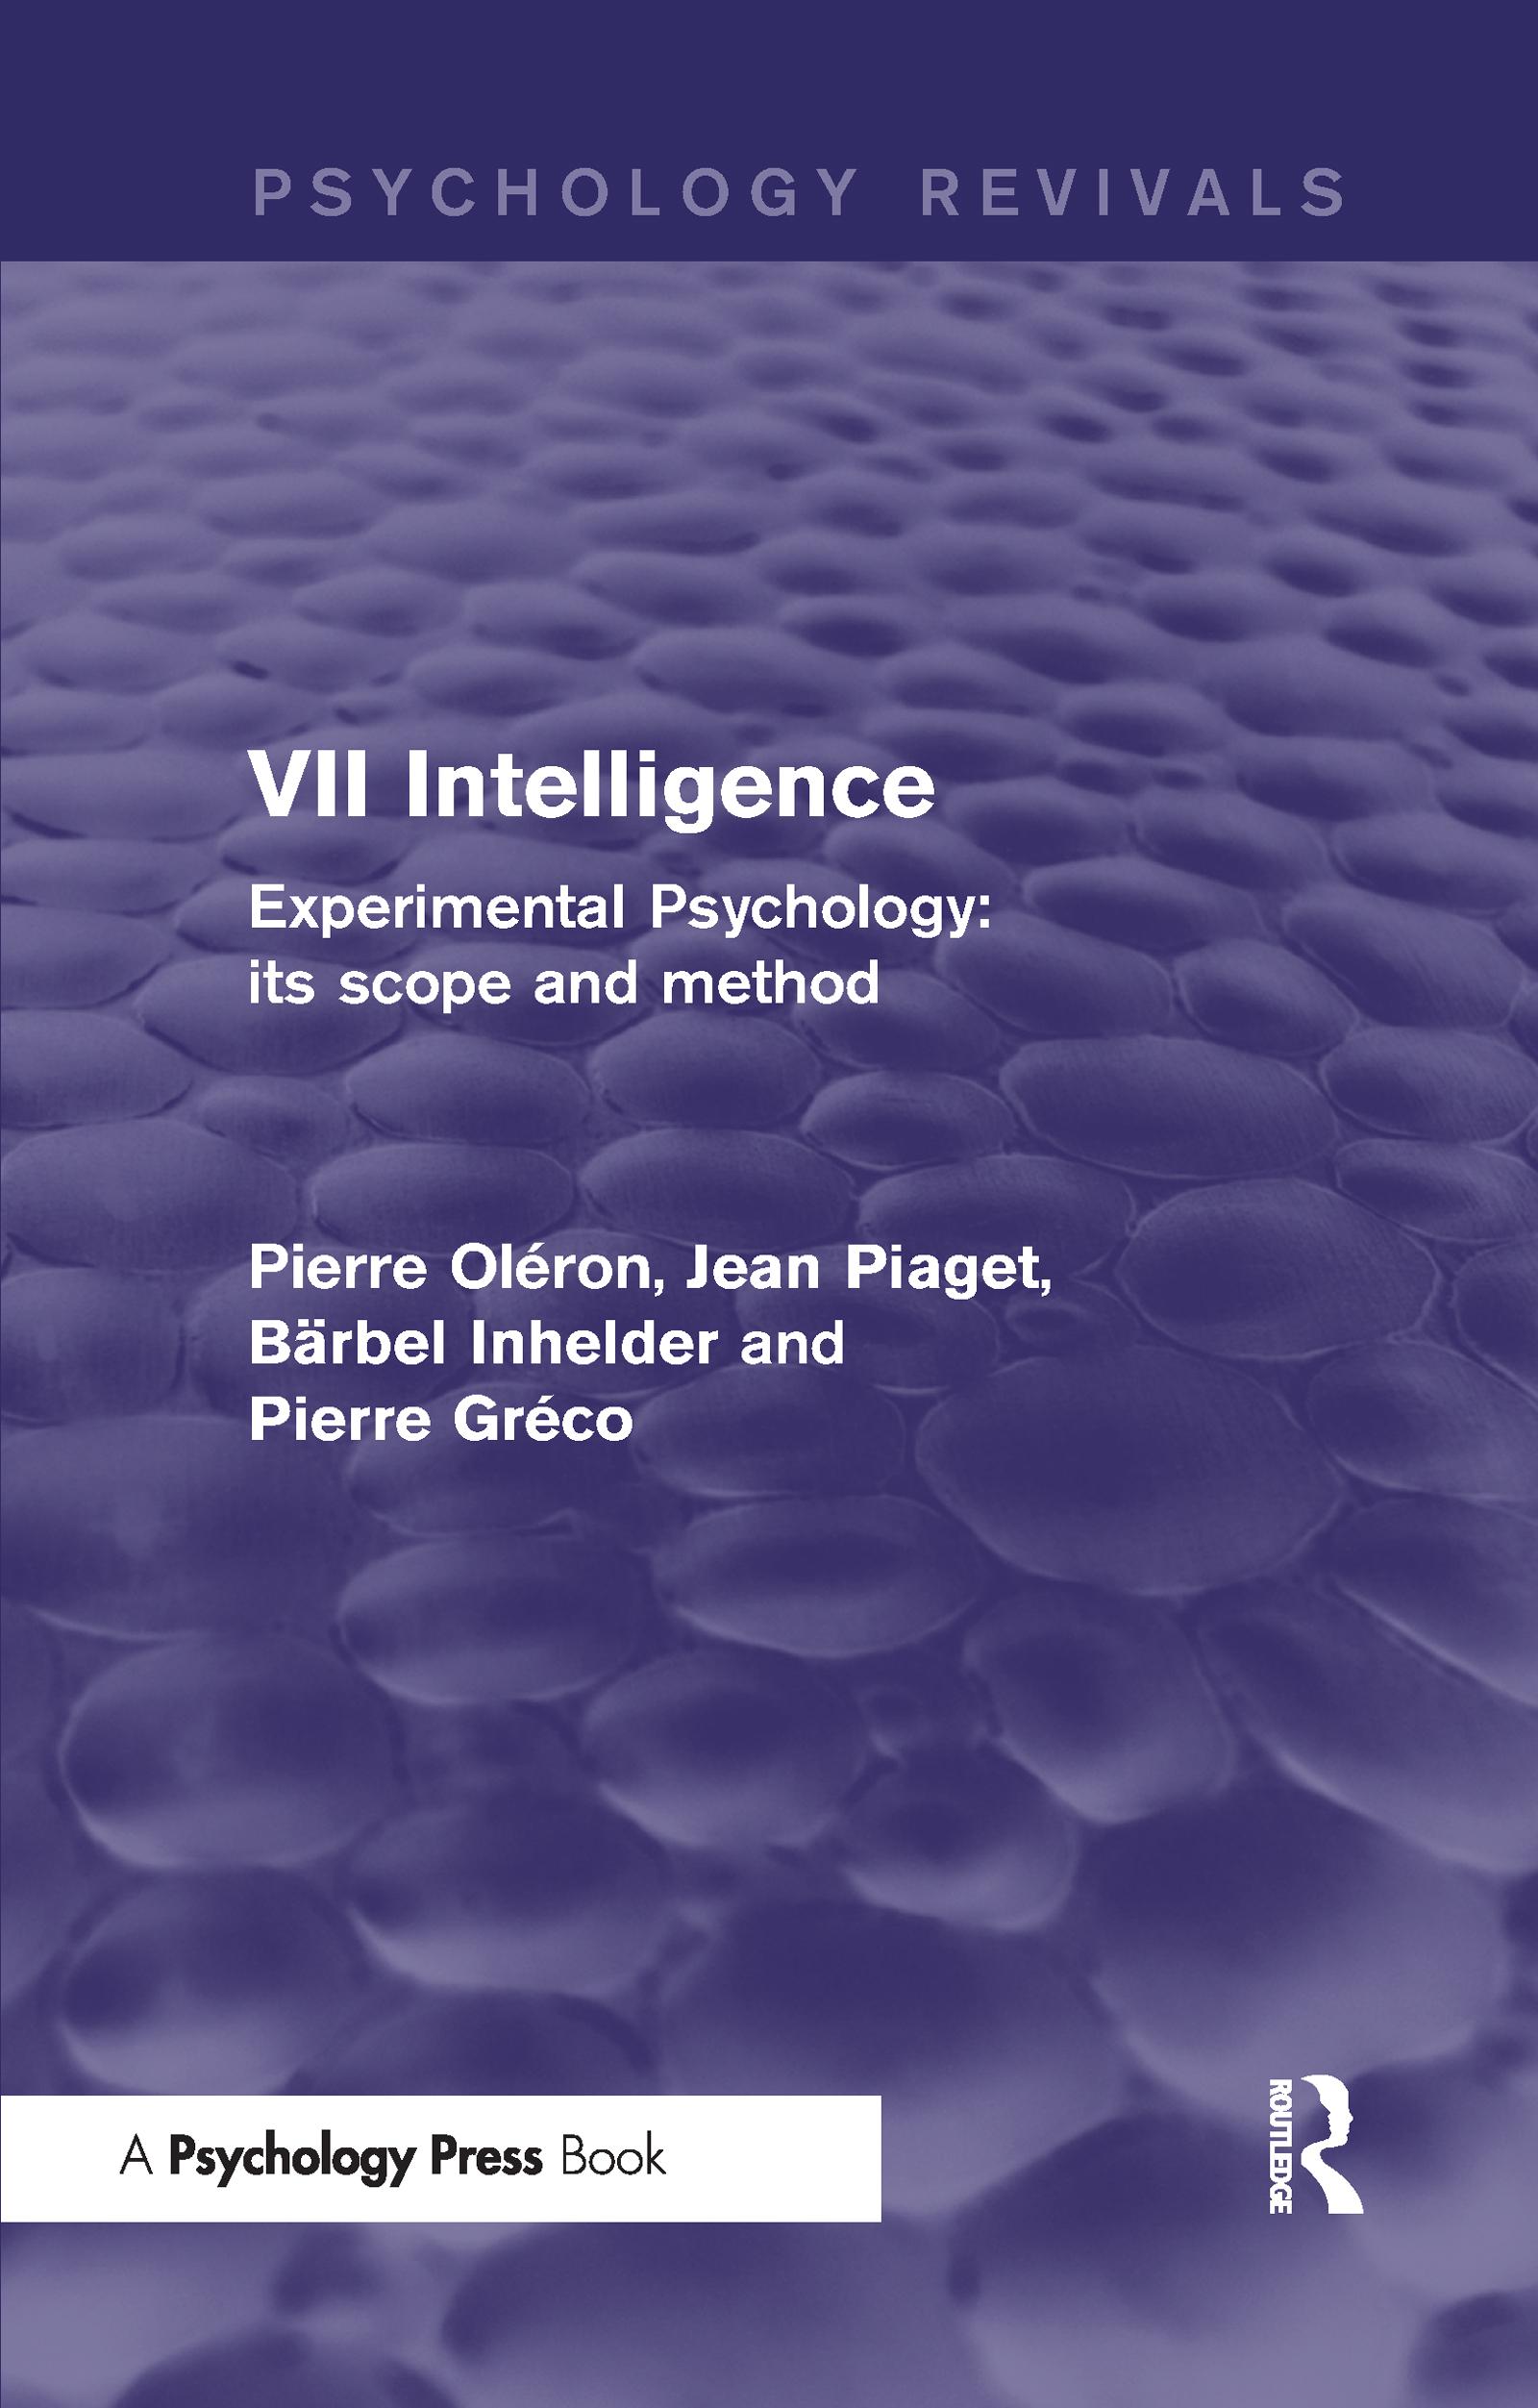 Experimental Psychology Its Scope and Method: Volume VII (Psychology Revivals)